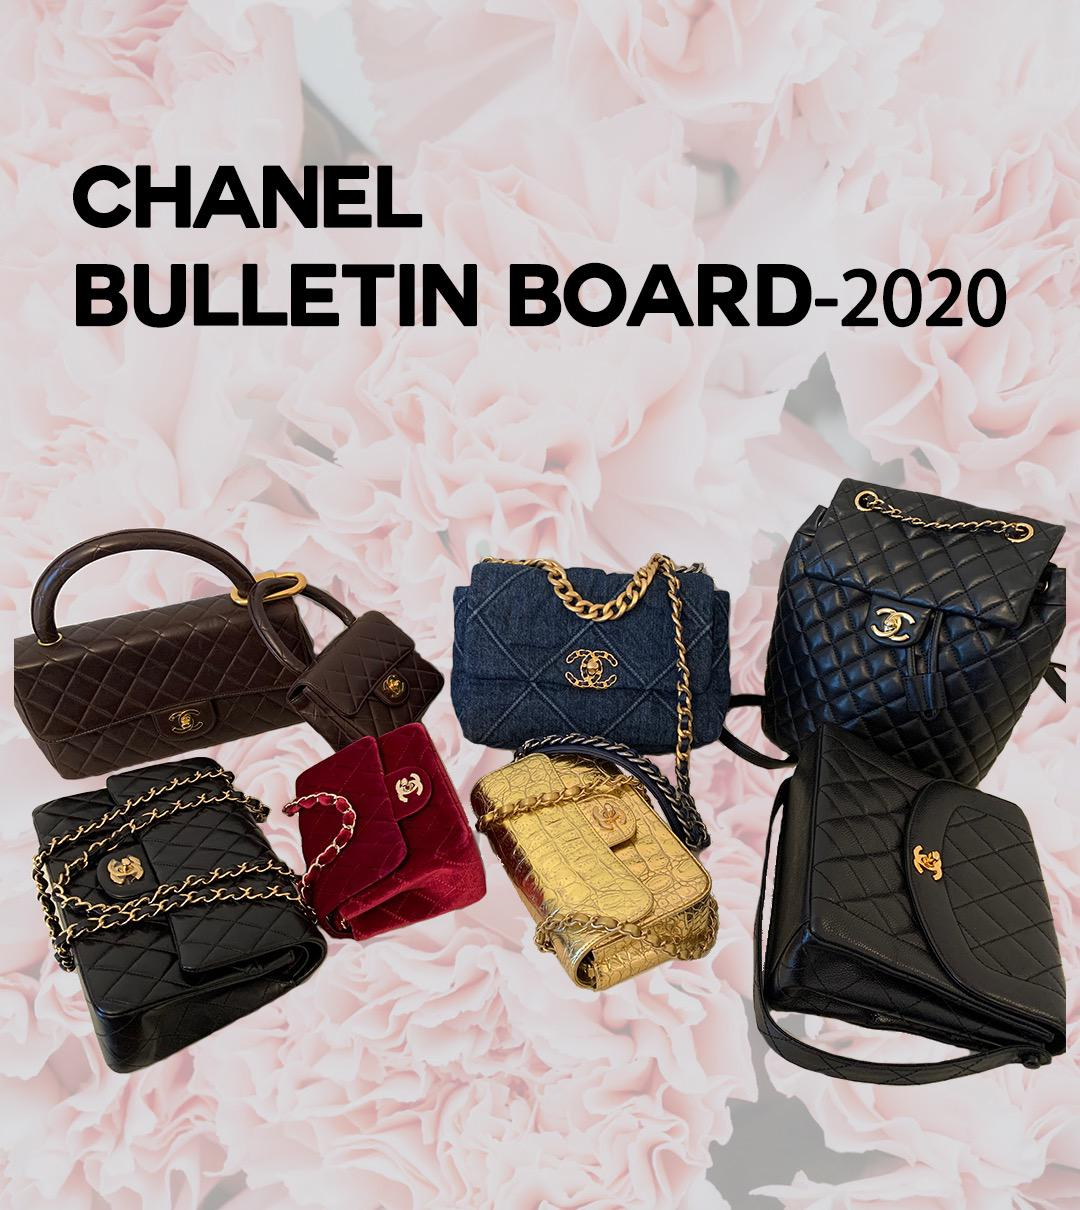 Chanel Bulletin Board 2020